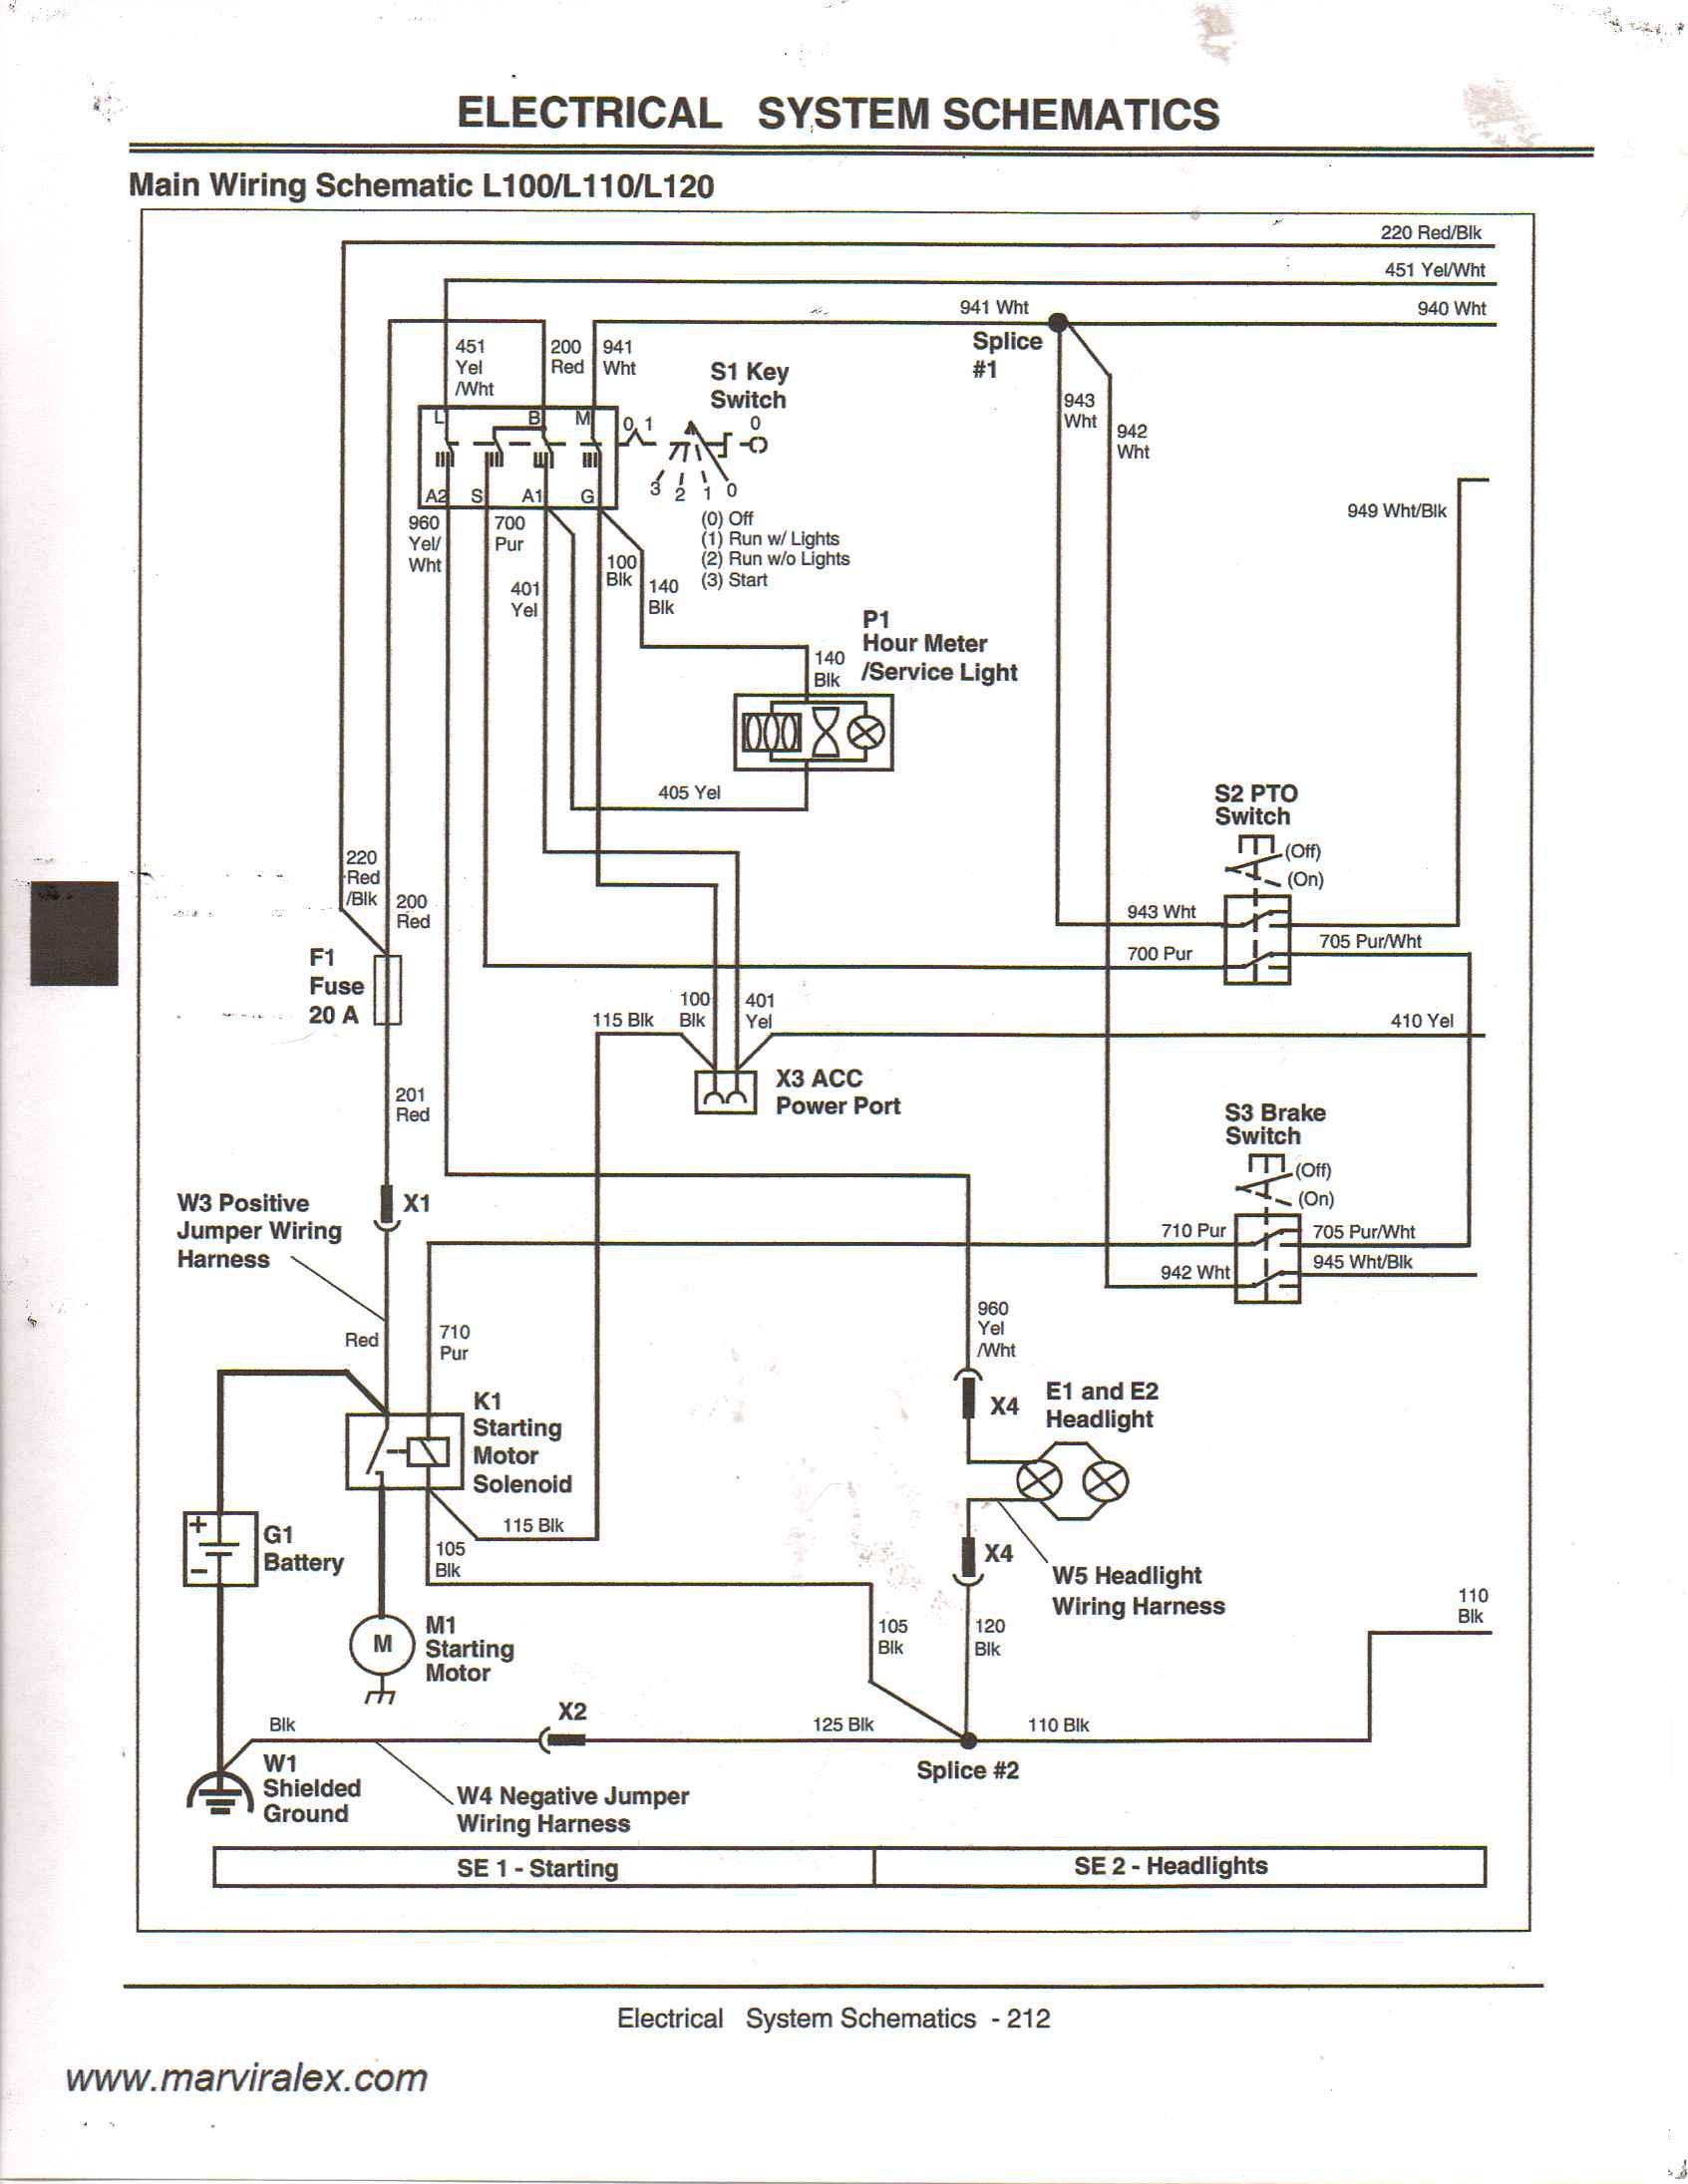 john deere 140 wiring harness diagram - giant.04alucard.seblock.de  diagram source